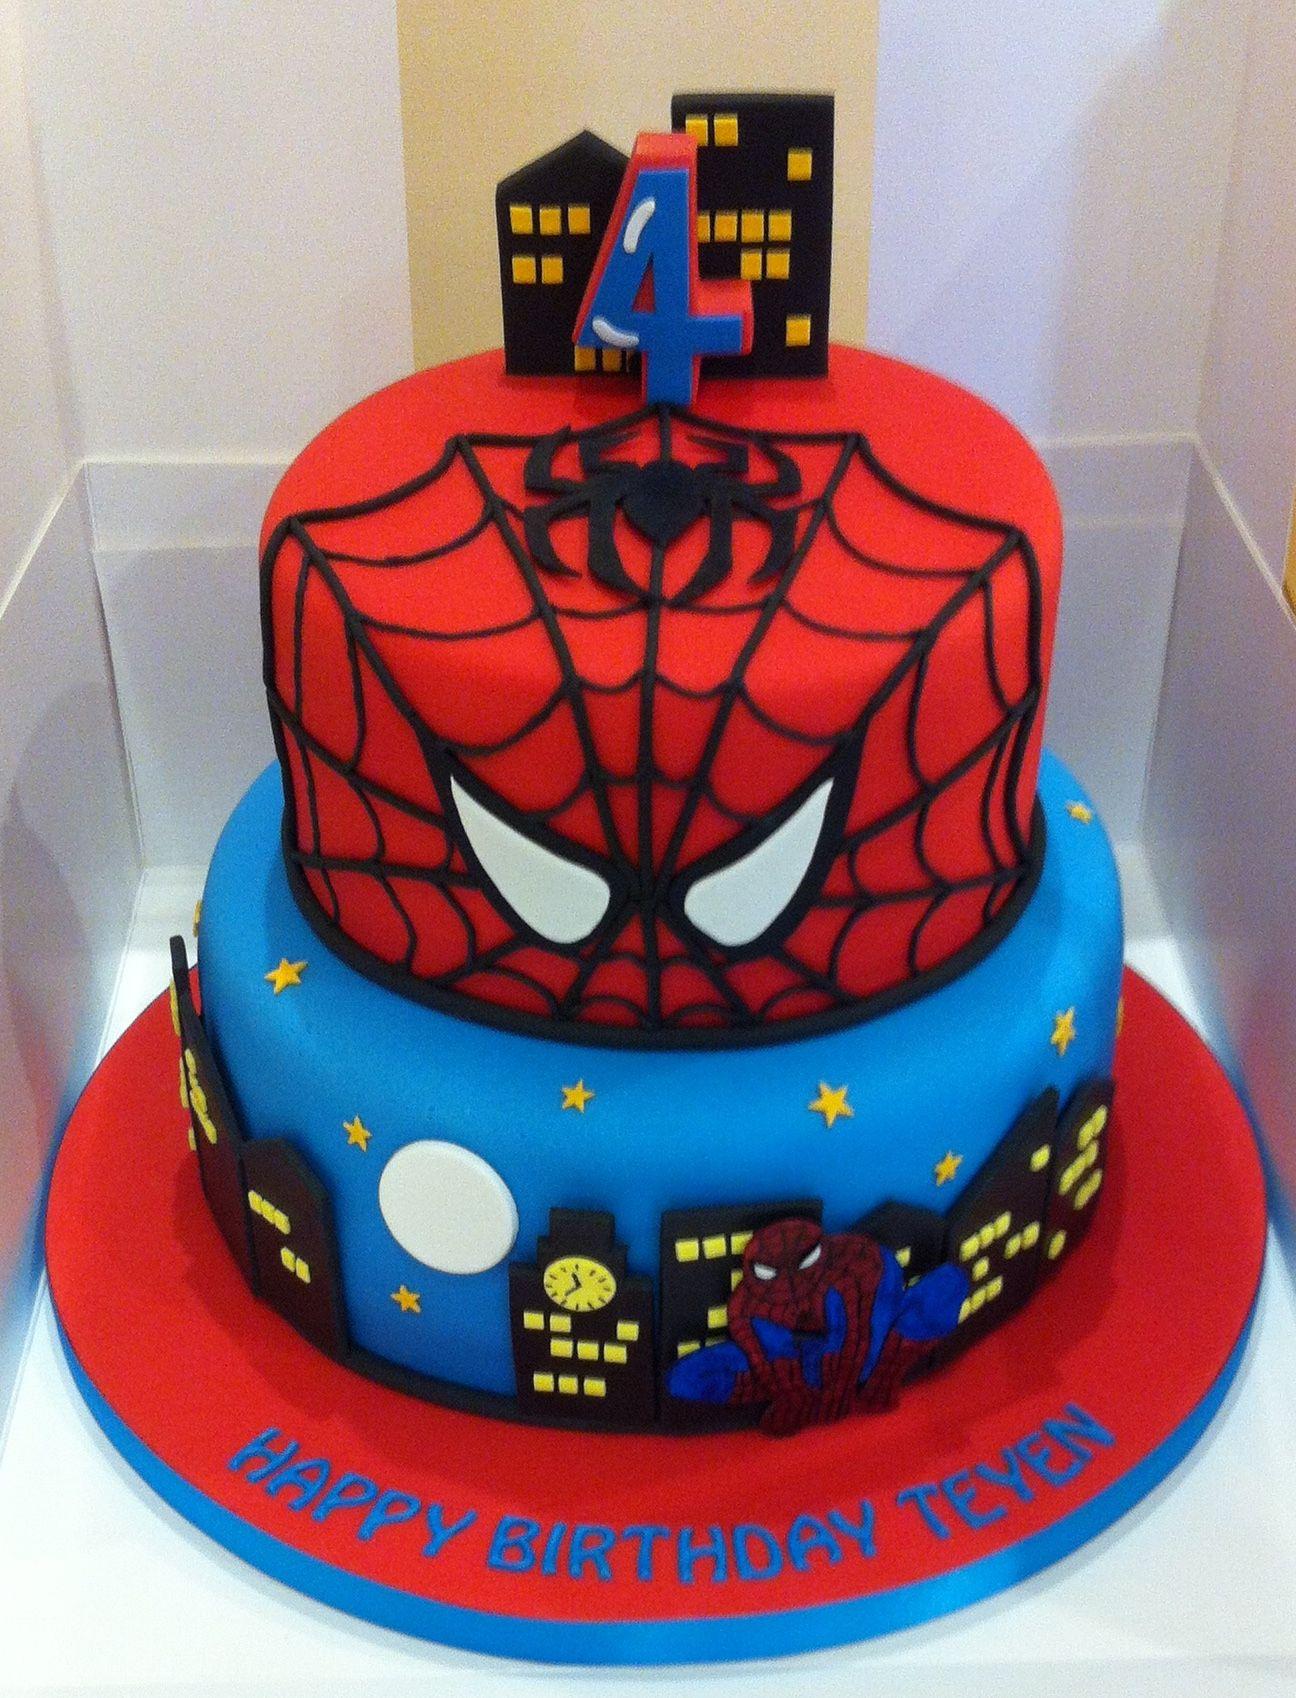 Incy Wincy Spider Birthday Cake